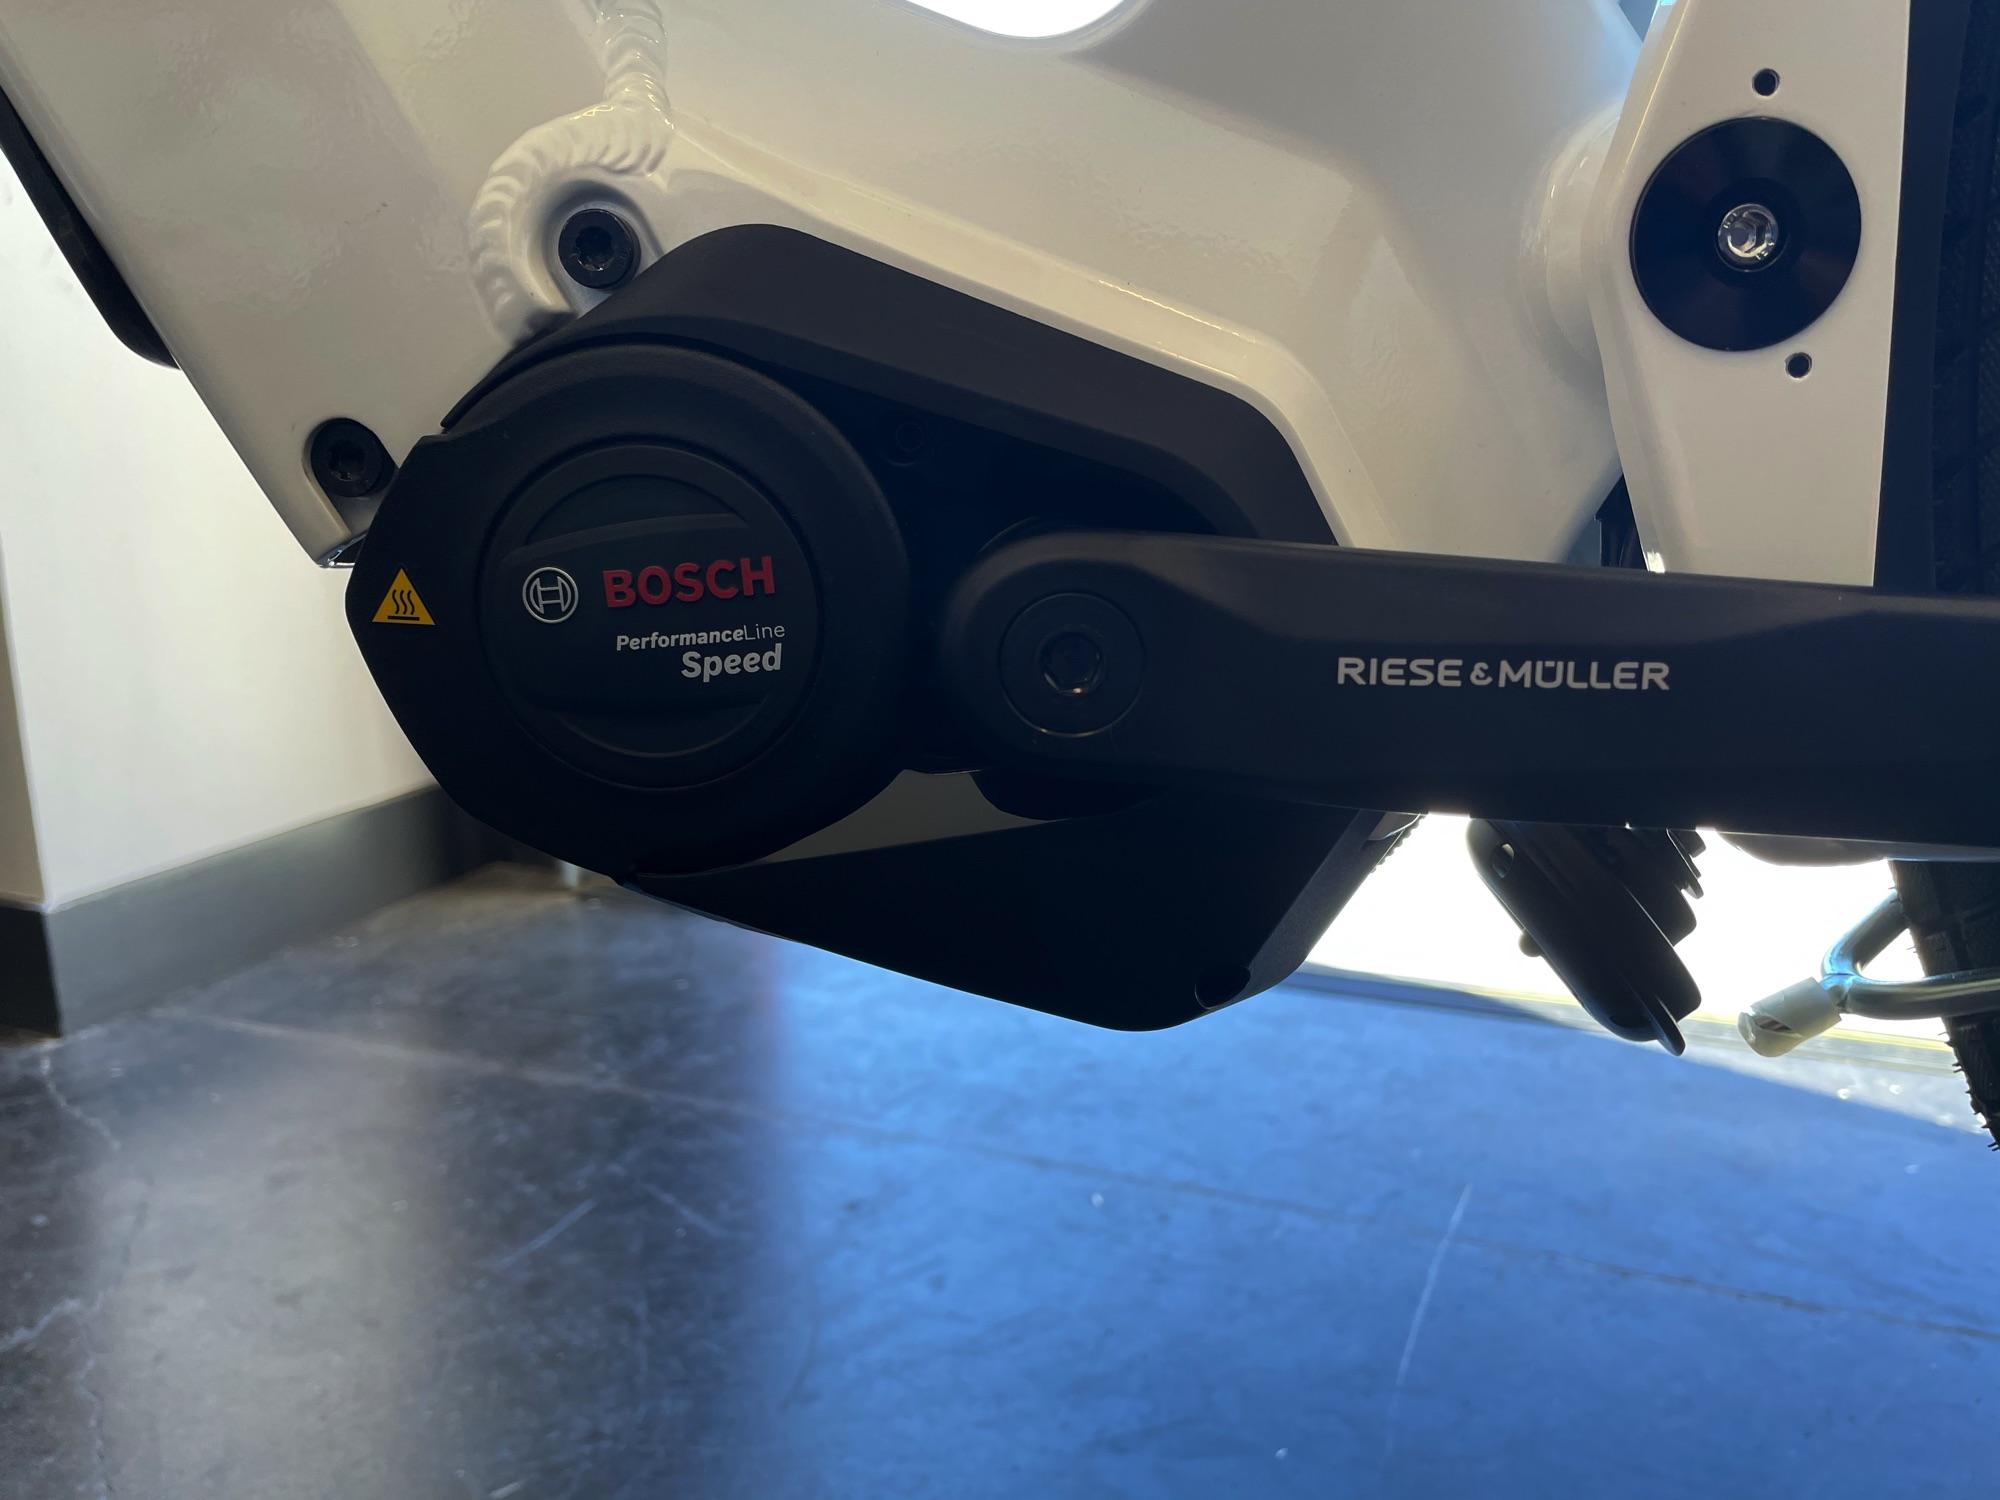 Riese and Muller Homage GT Vario HS, Bosch Gen4, Kiox